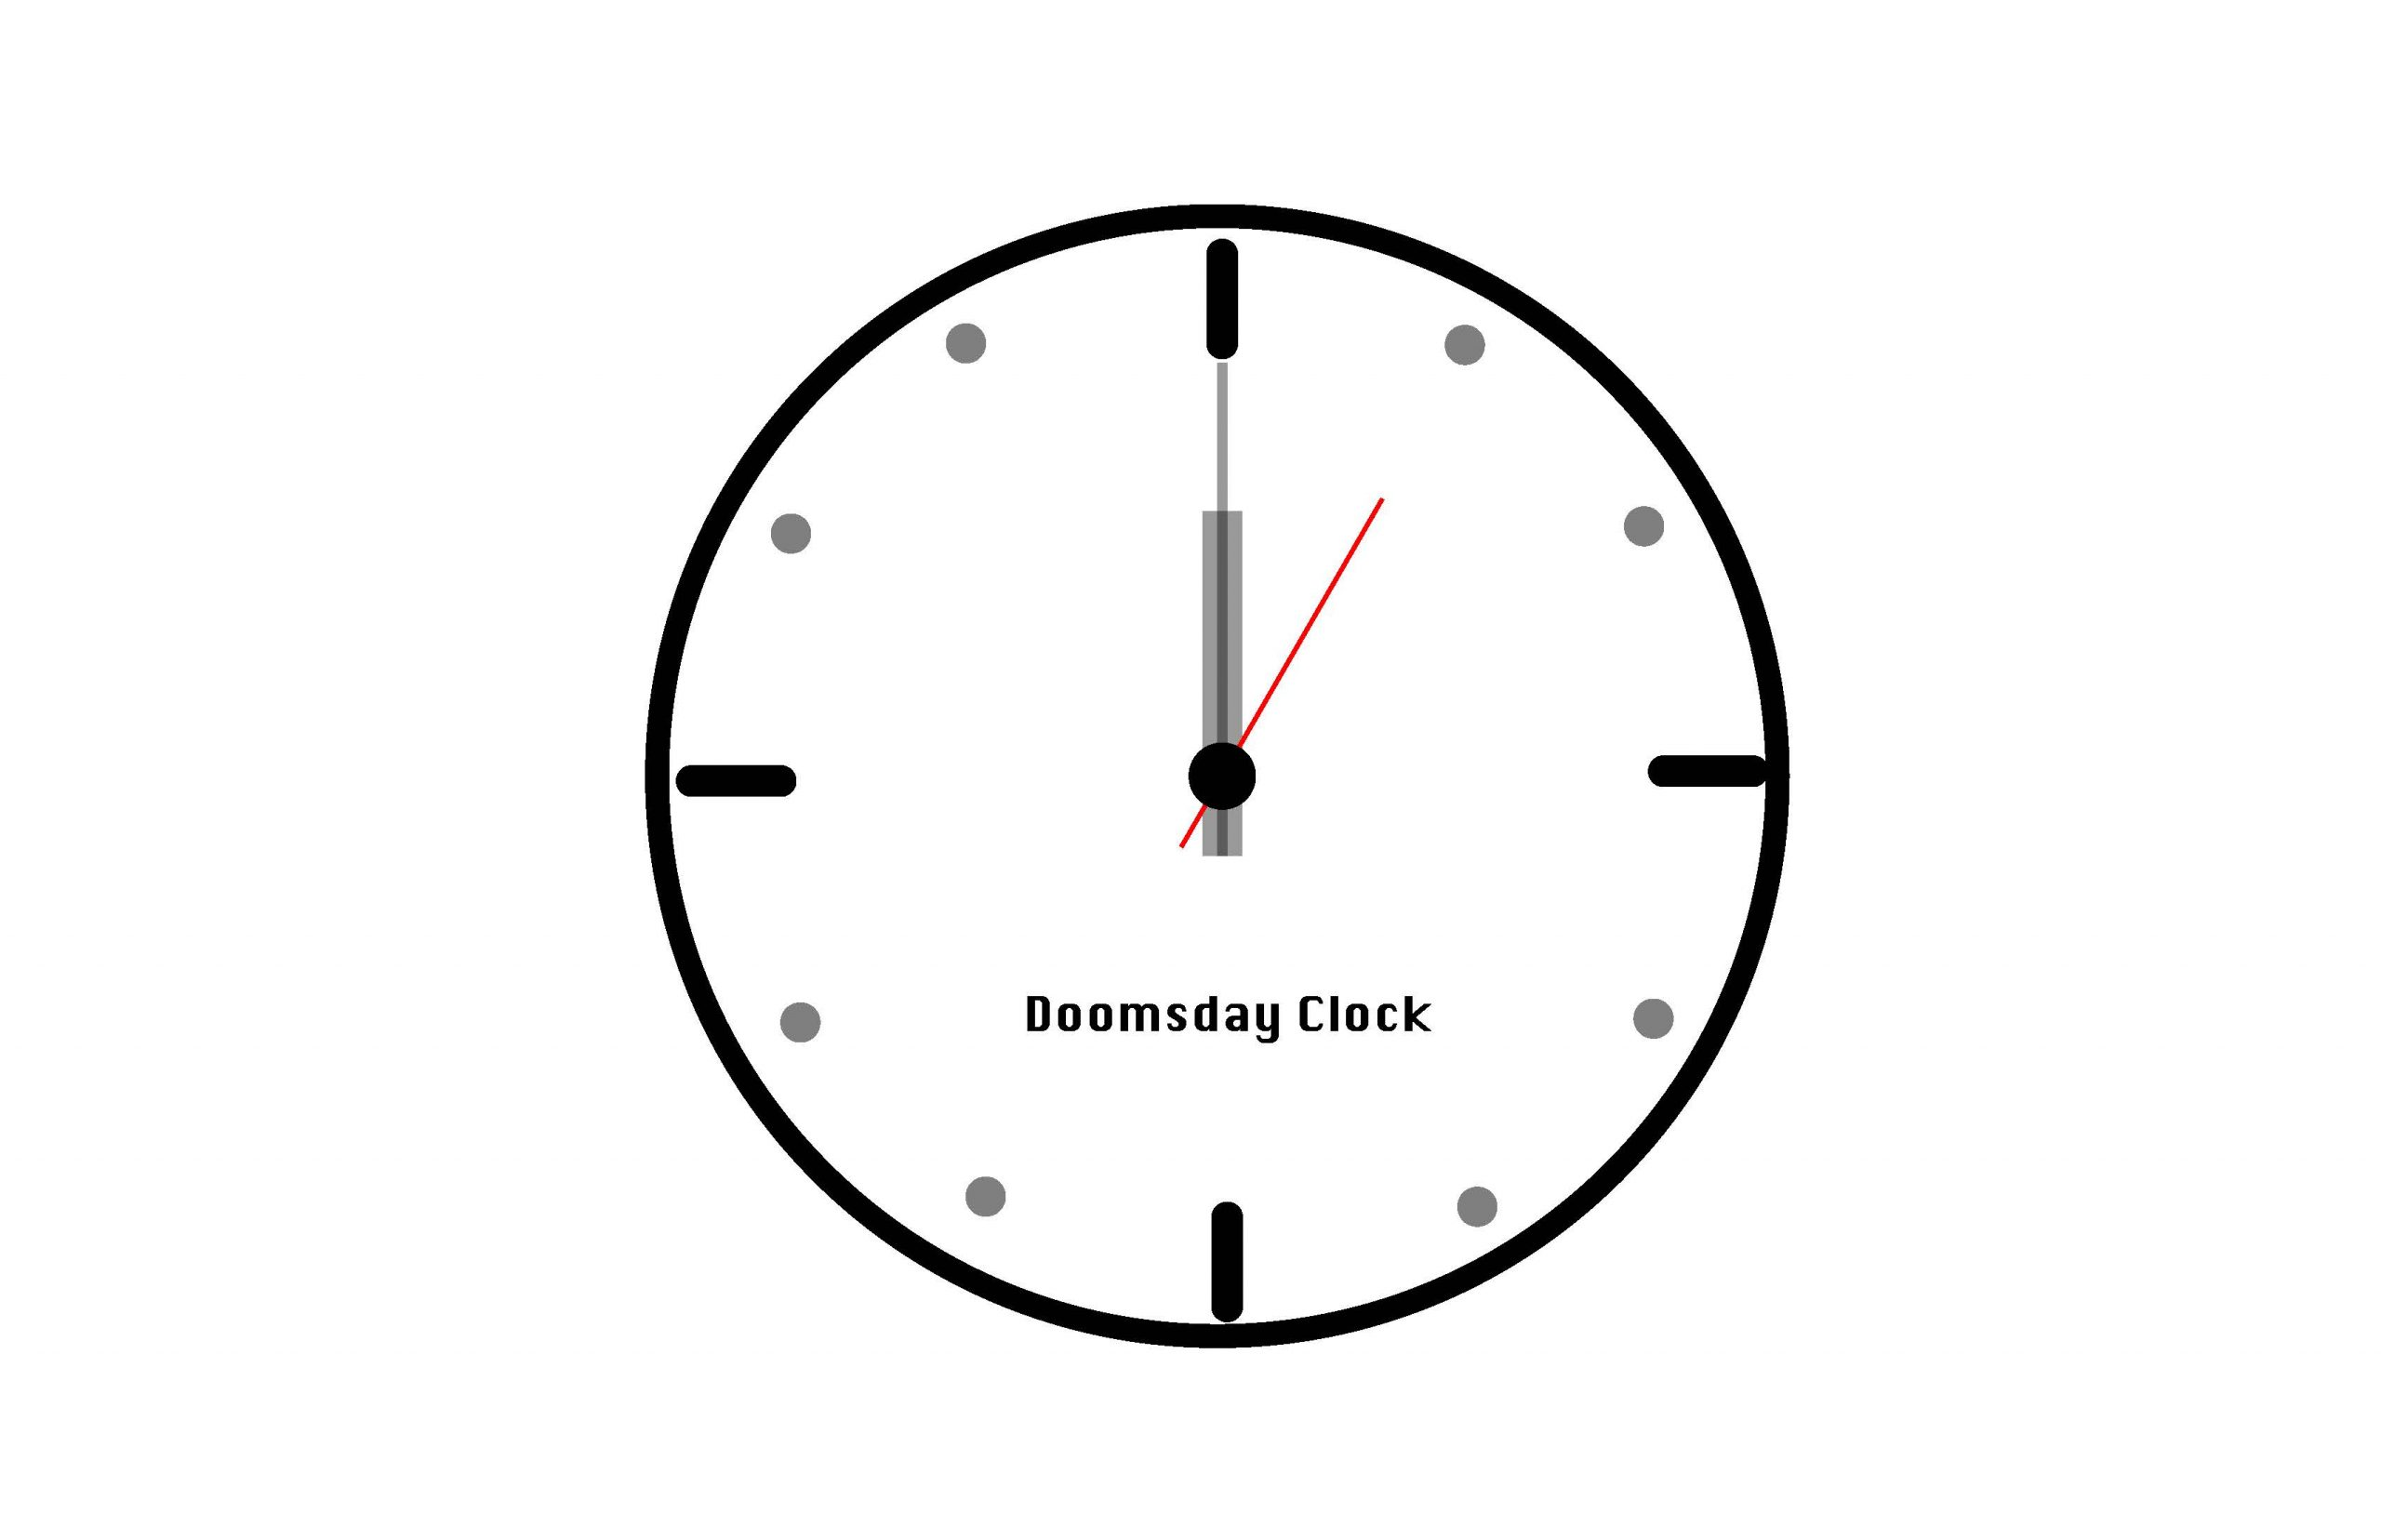 Christine Gao - Doomsday Clock